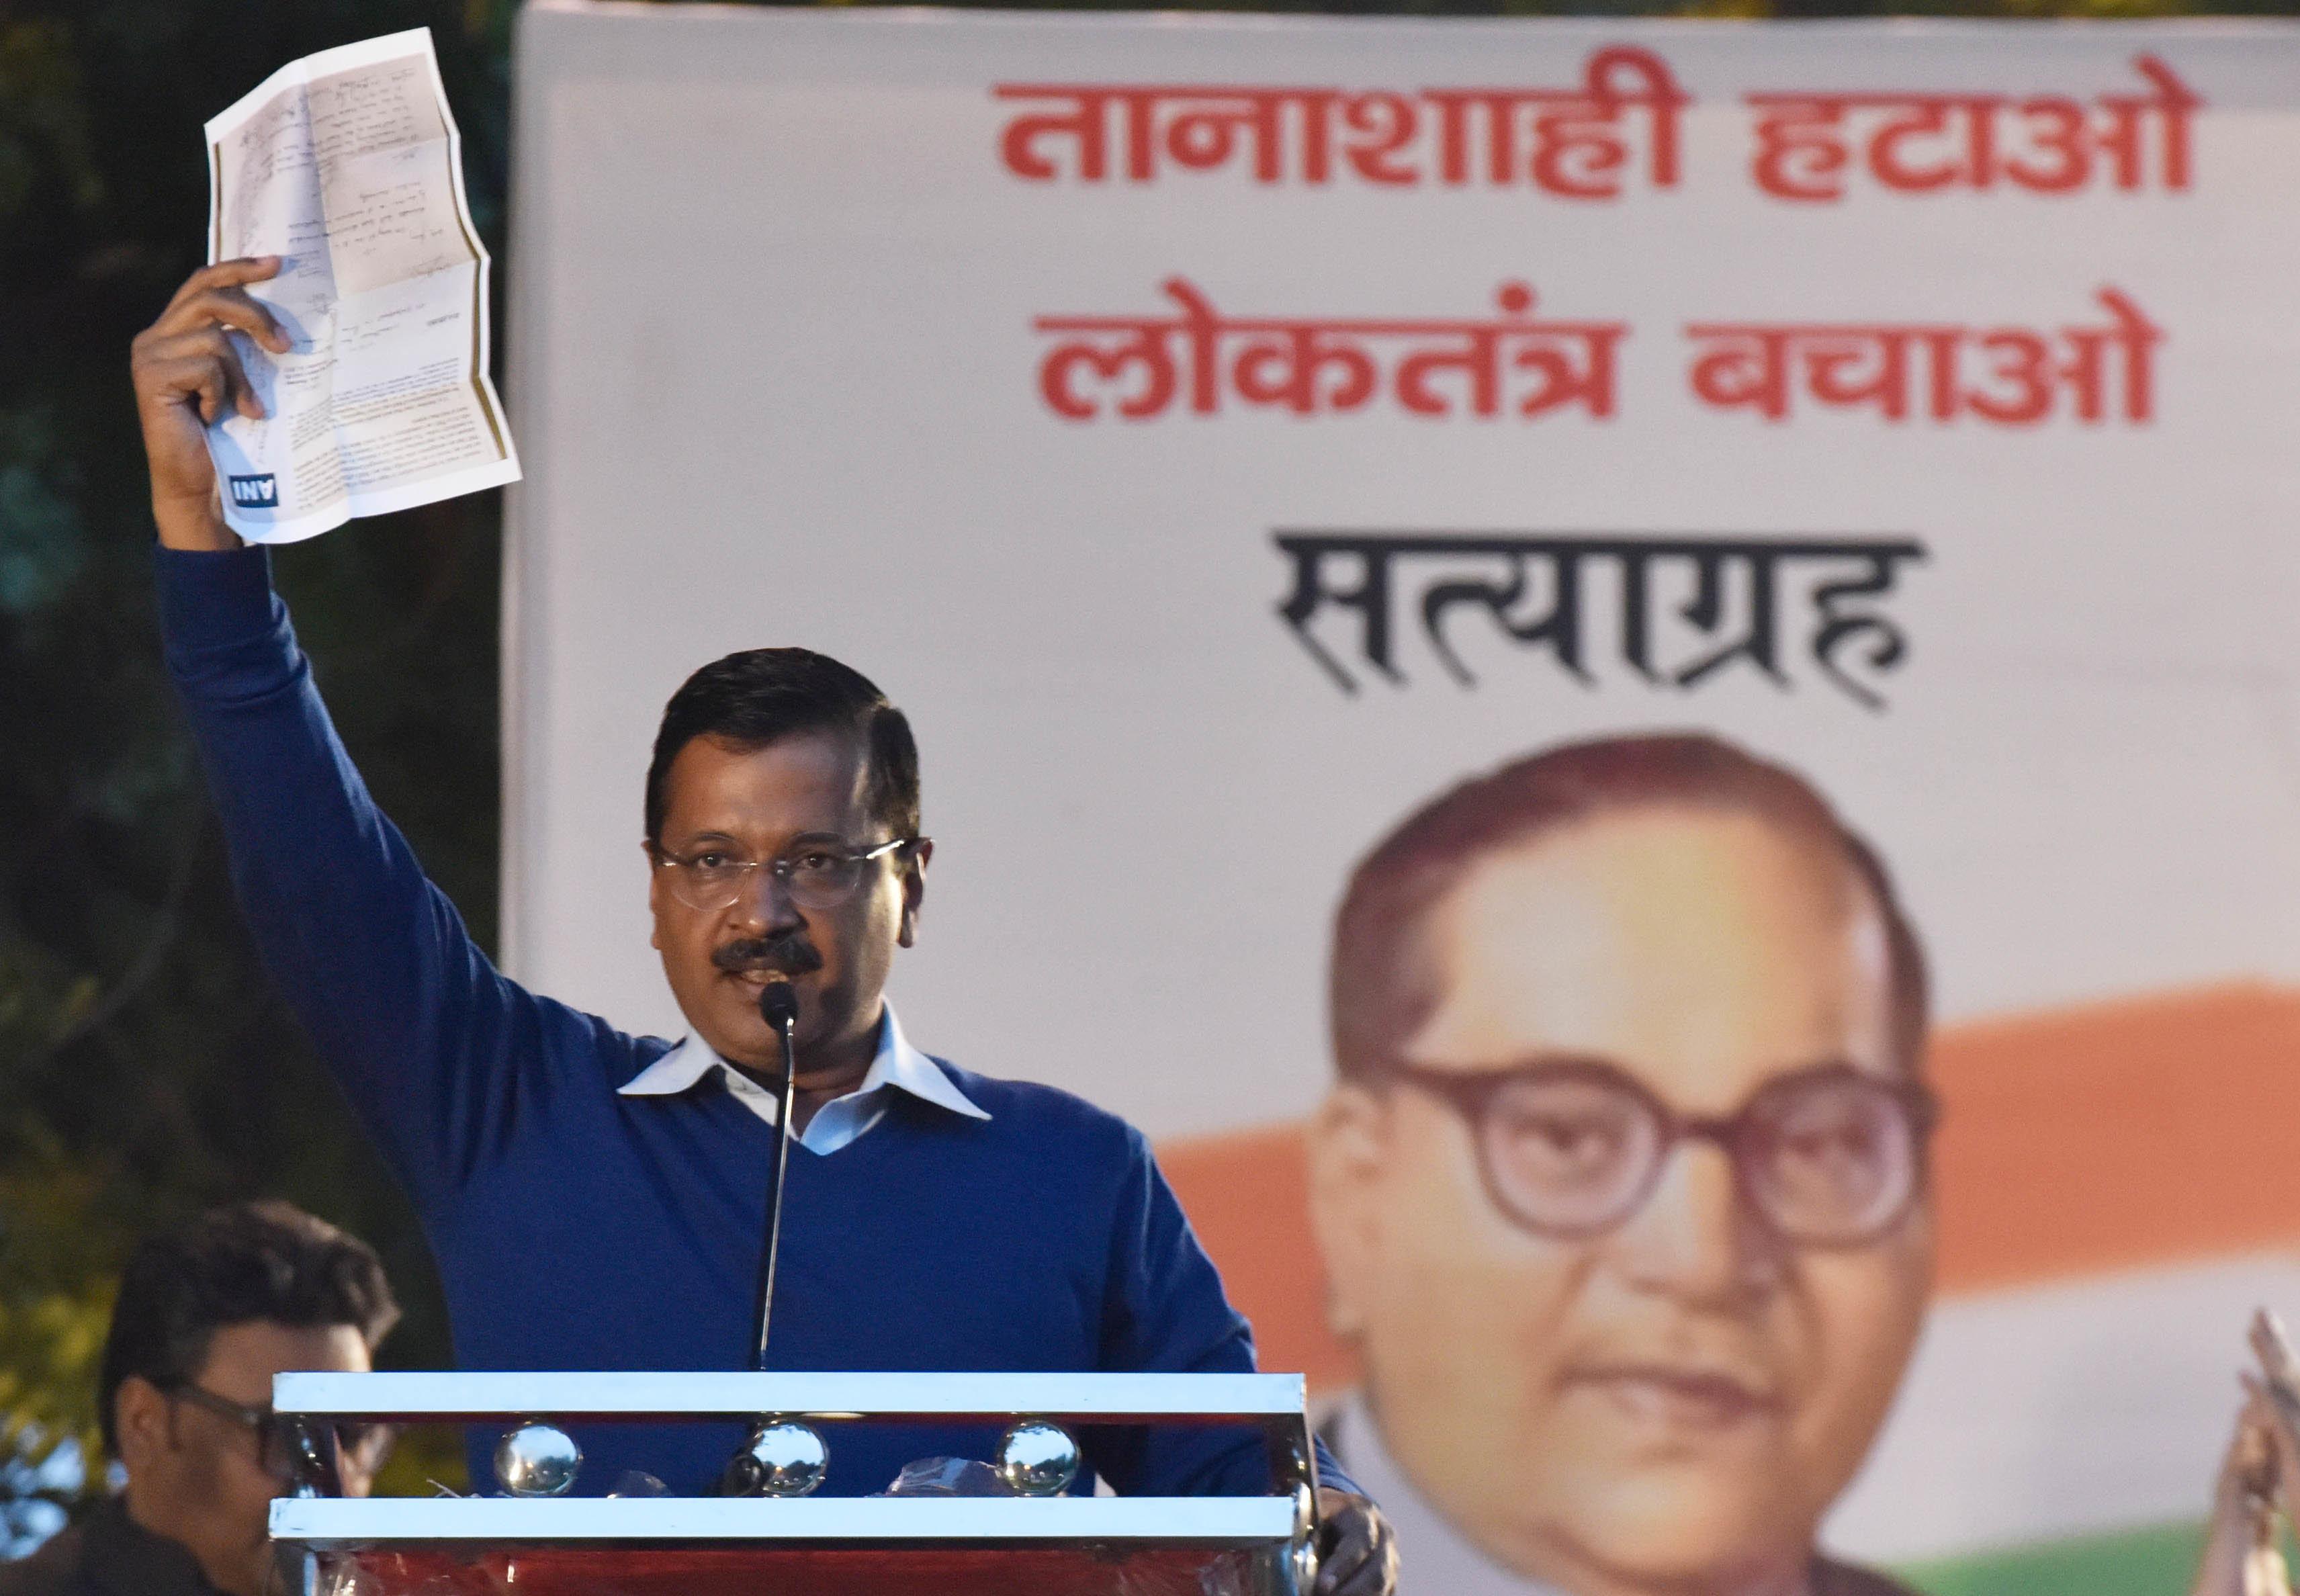 Delhi Govt Vs Centre: Will Fight For Full Statehood, Says Kejriwal After SC